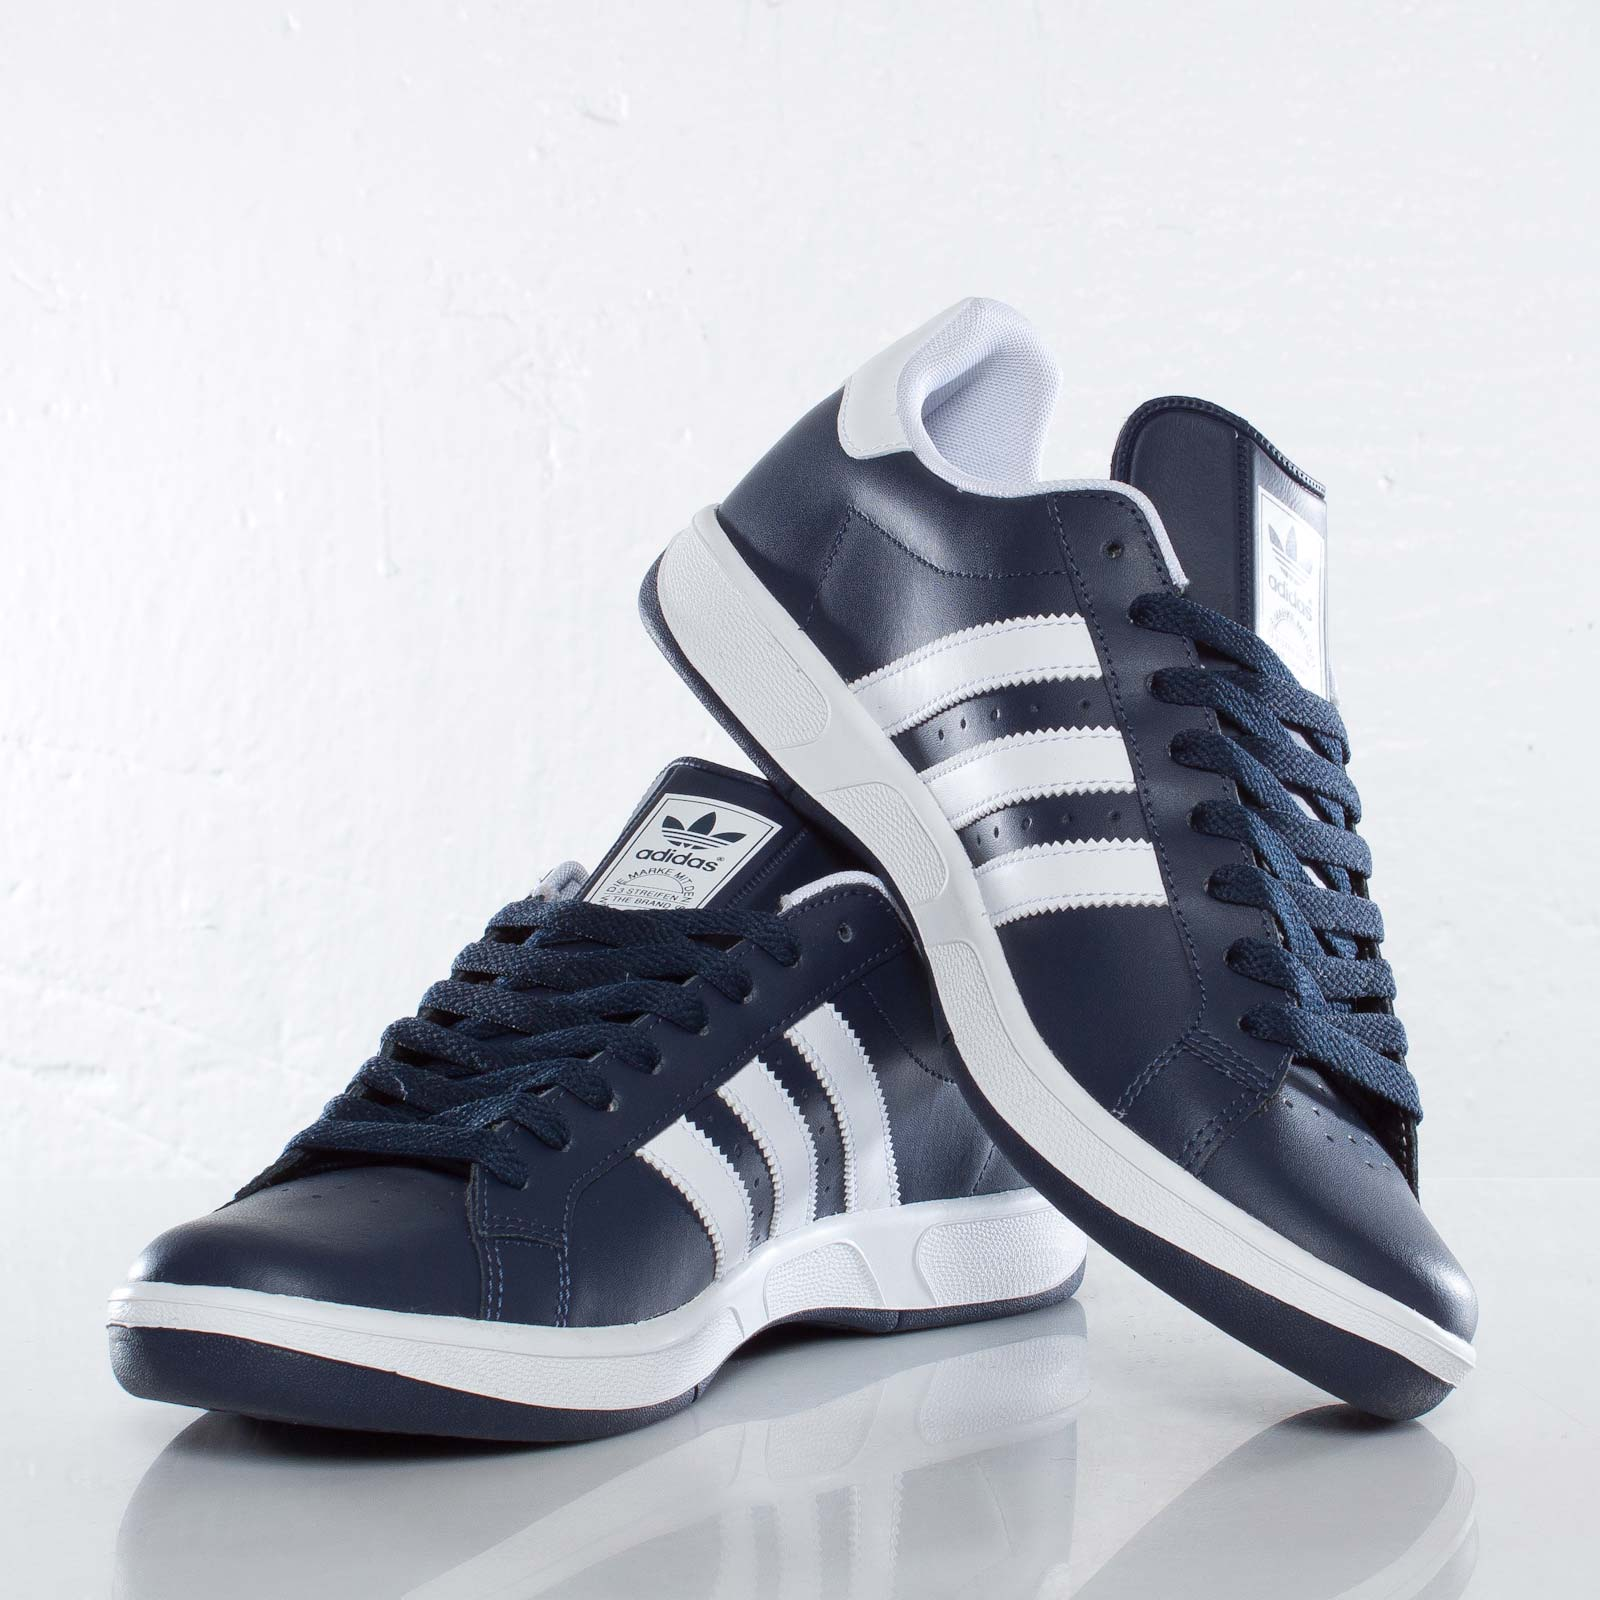 low priced 206bf 75ca4 adidas Grand Prix - G59936 - Sneakersnstuff   sneakers   streetwear online  since 1999